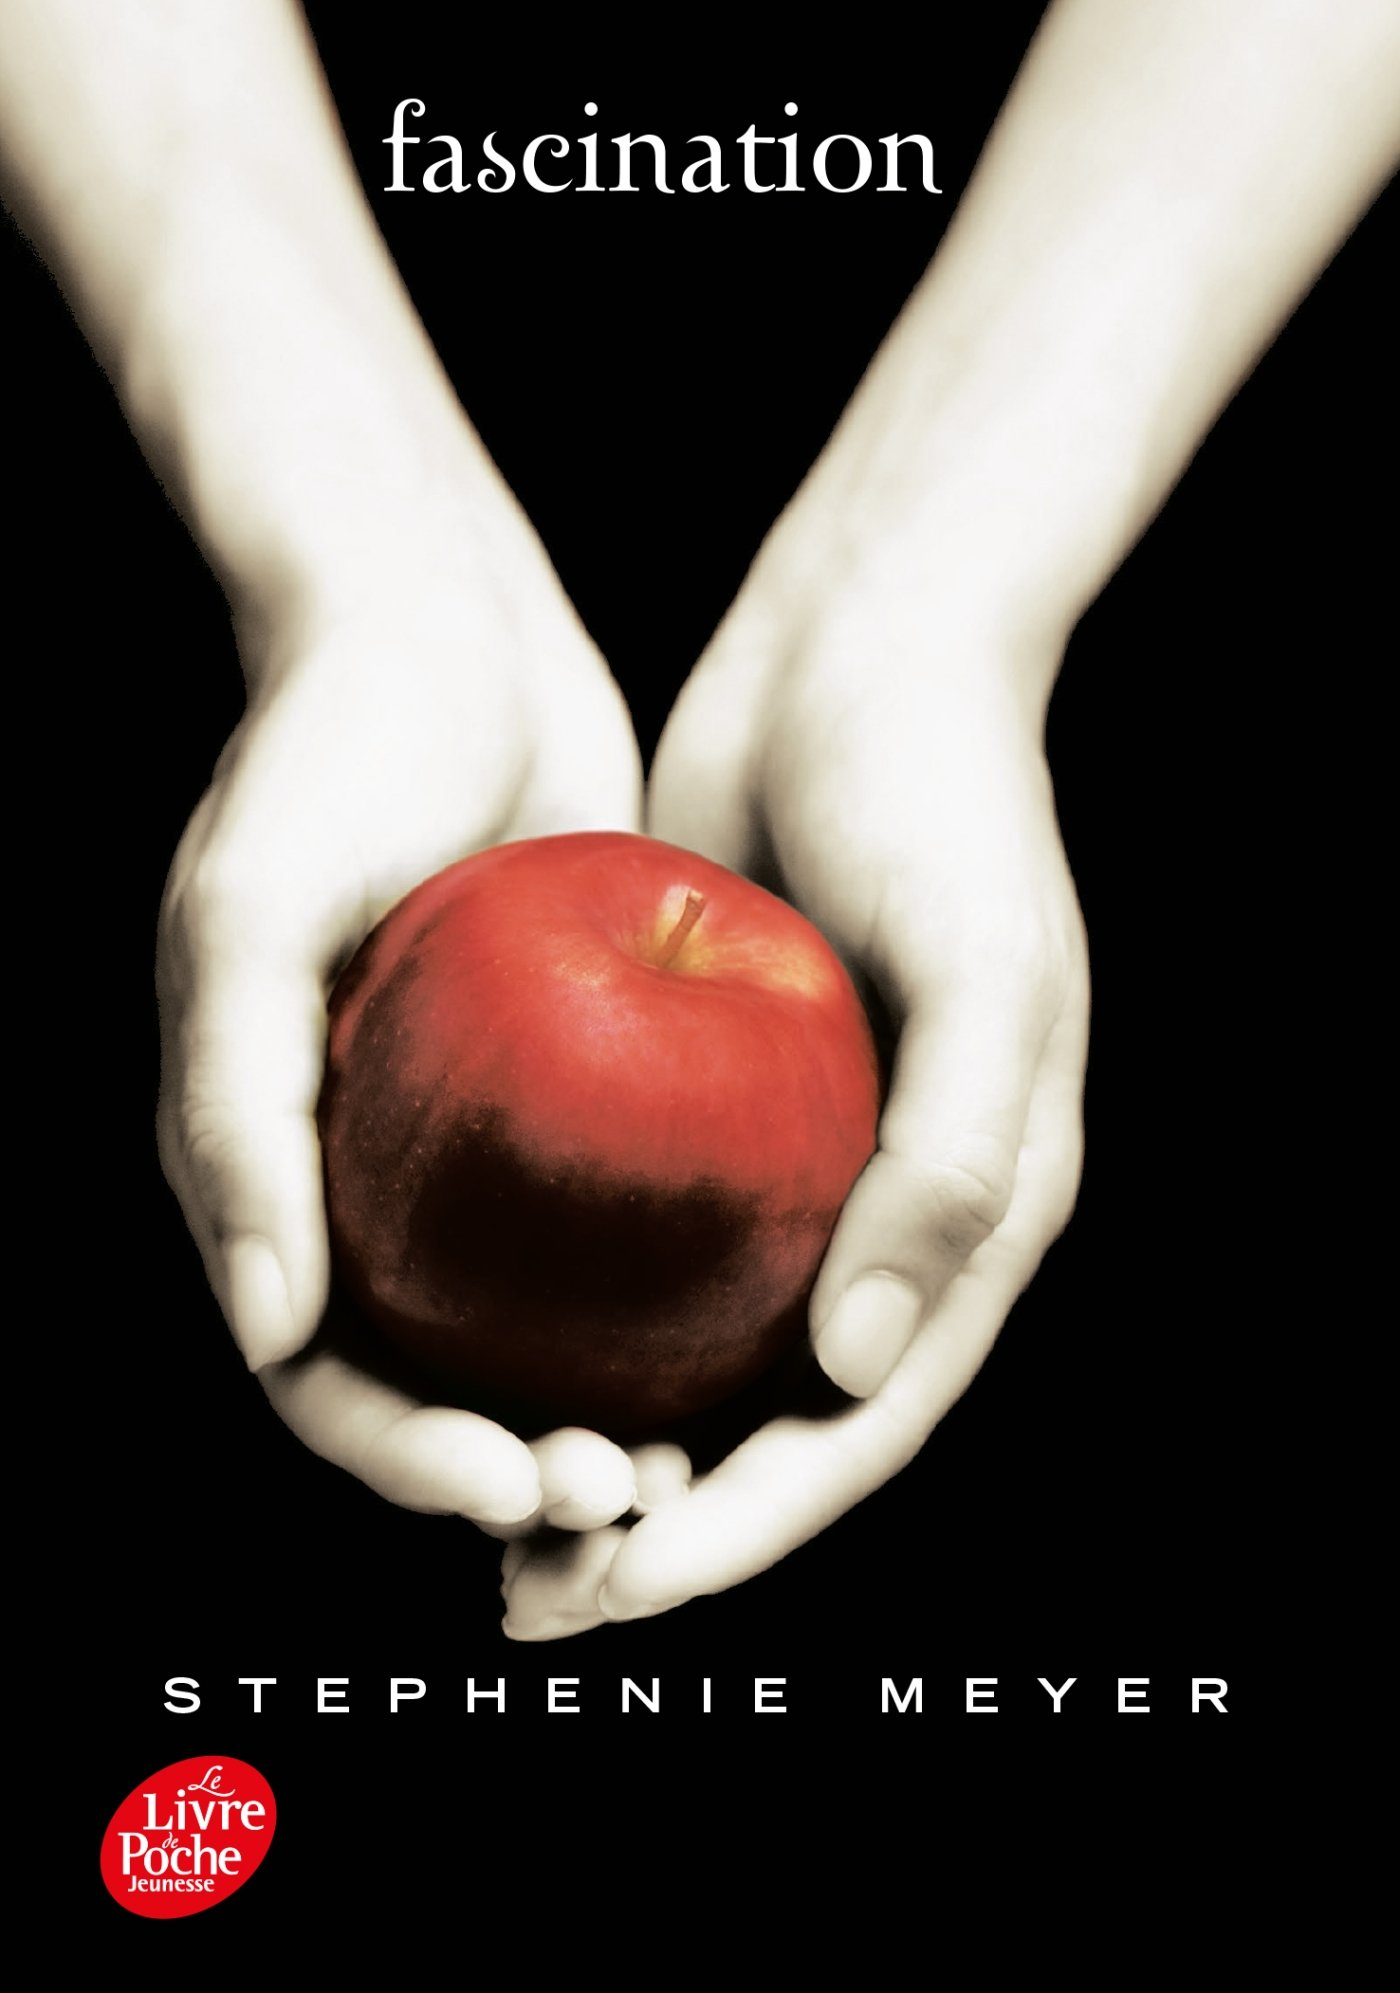 Twilight, Tome 1 : Fascination (Francese) Copertina flessibile – 12 gen 2011 Stephenie Meyer Luc Rigoureau POCHE JEUNESSE 2013212119